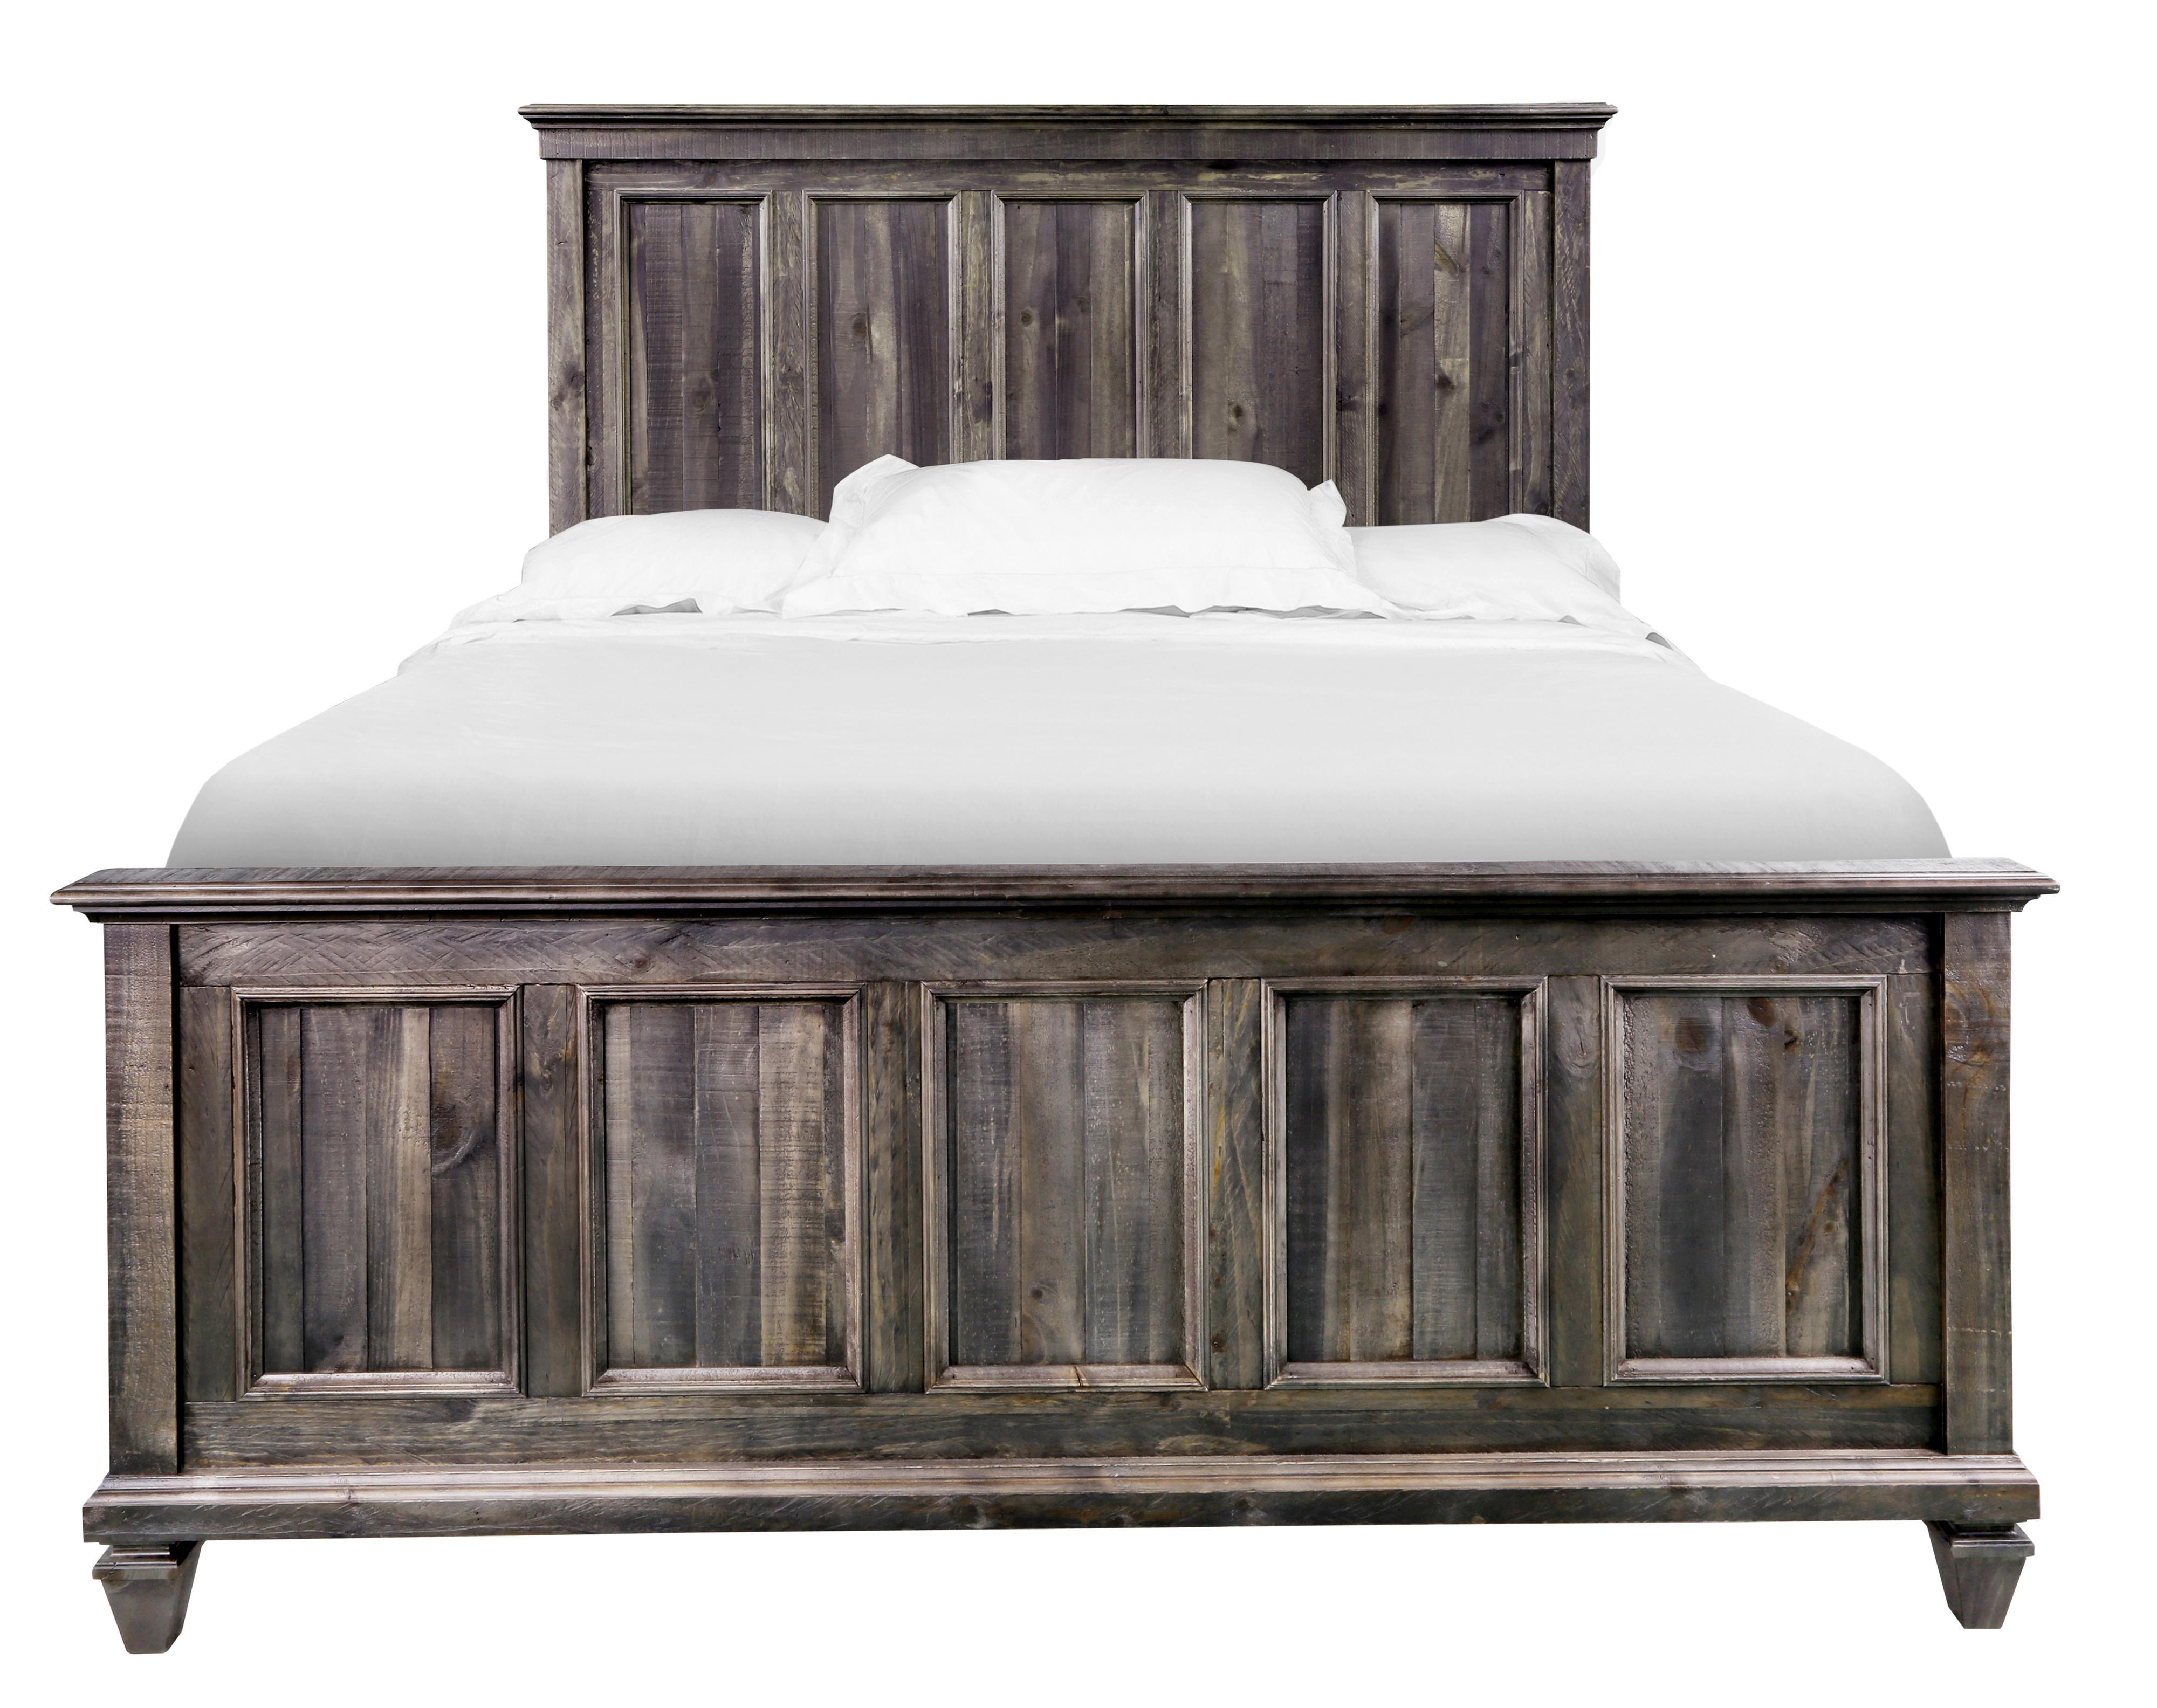 Benton King Bed at Walker's Furniture